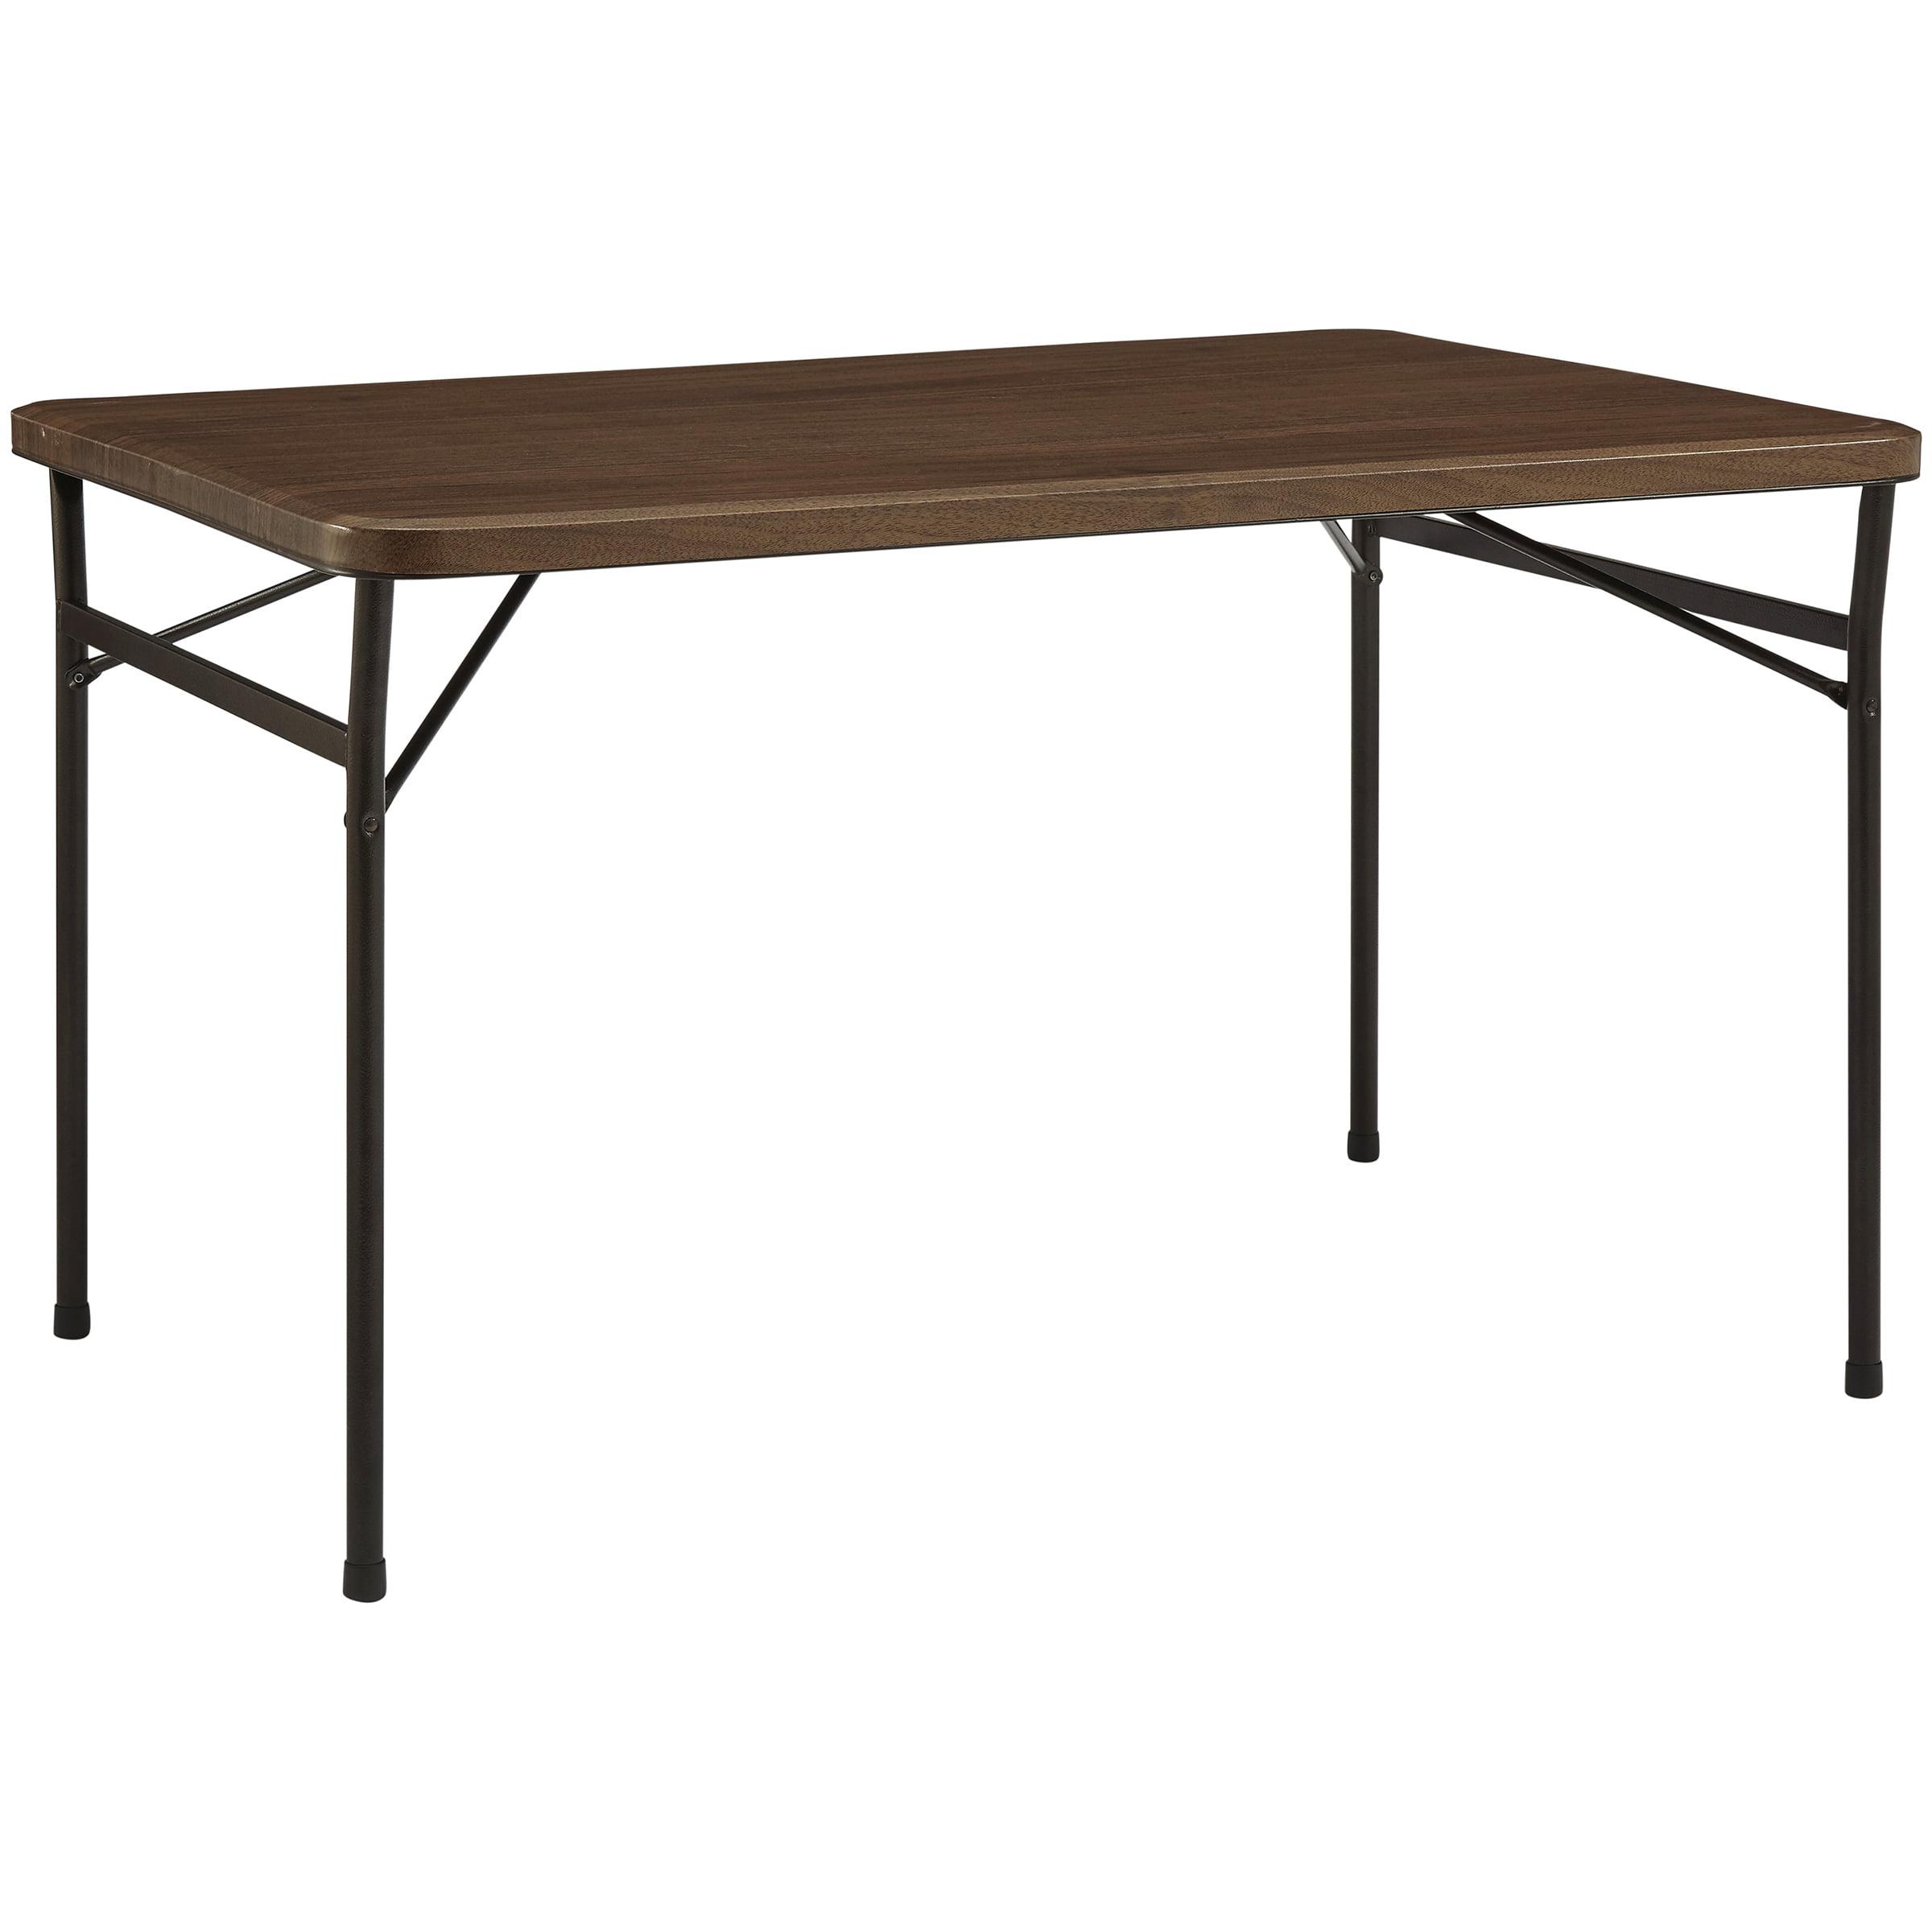 "Mainstays 48"" Faux Wood Folding Table, Walnut by New Tec Integration Xiamen Co., Ltd."